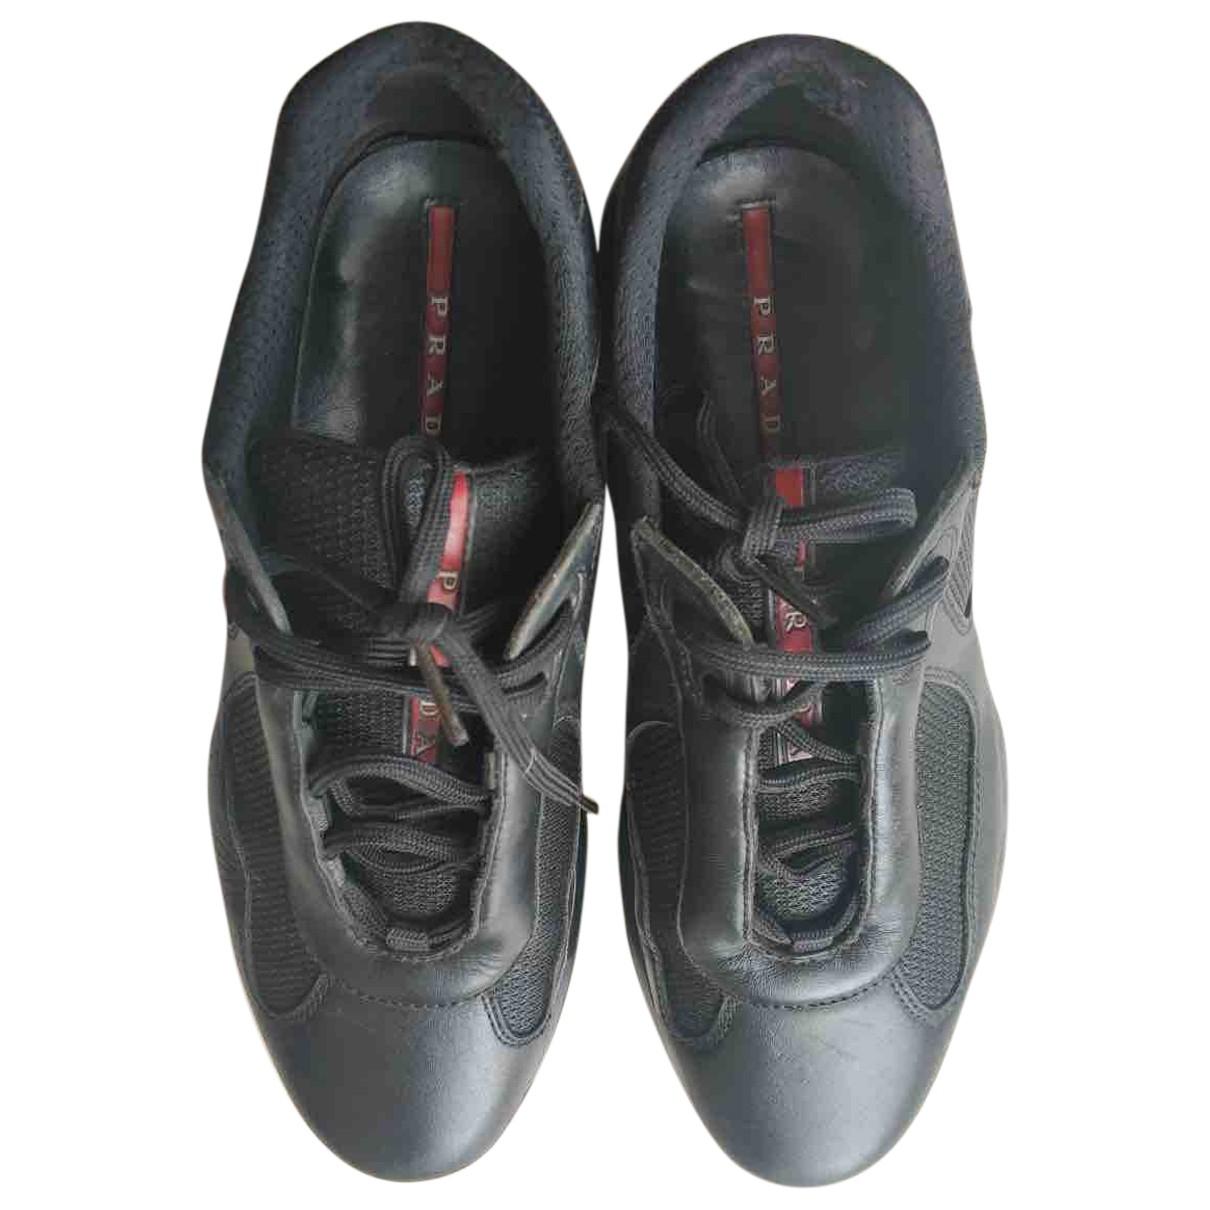 Prada N Black Leather Trainers for Men 7.5 UK